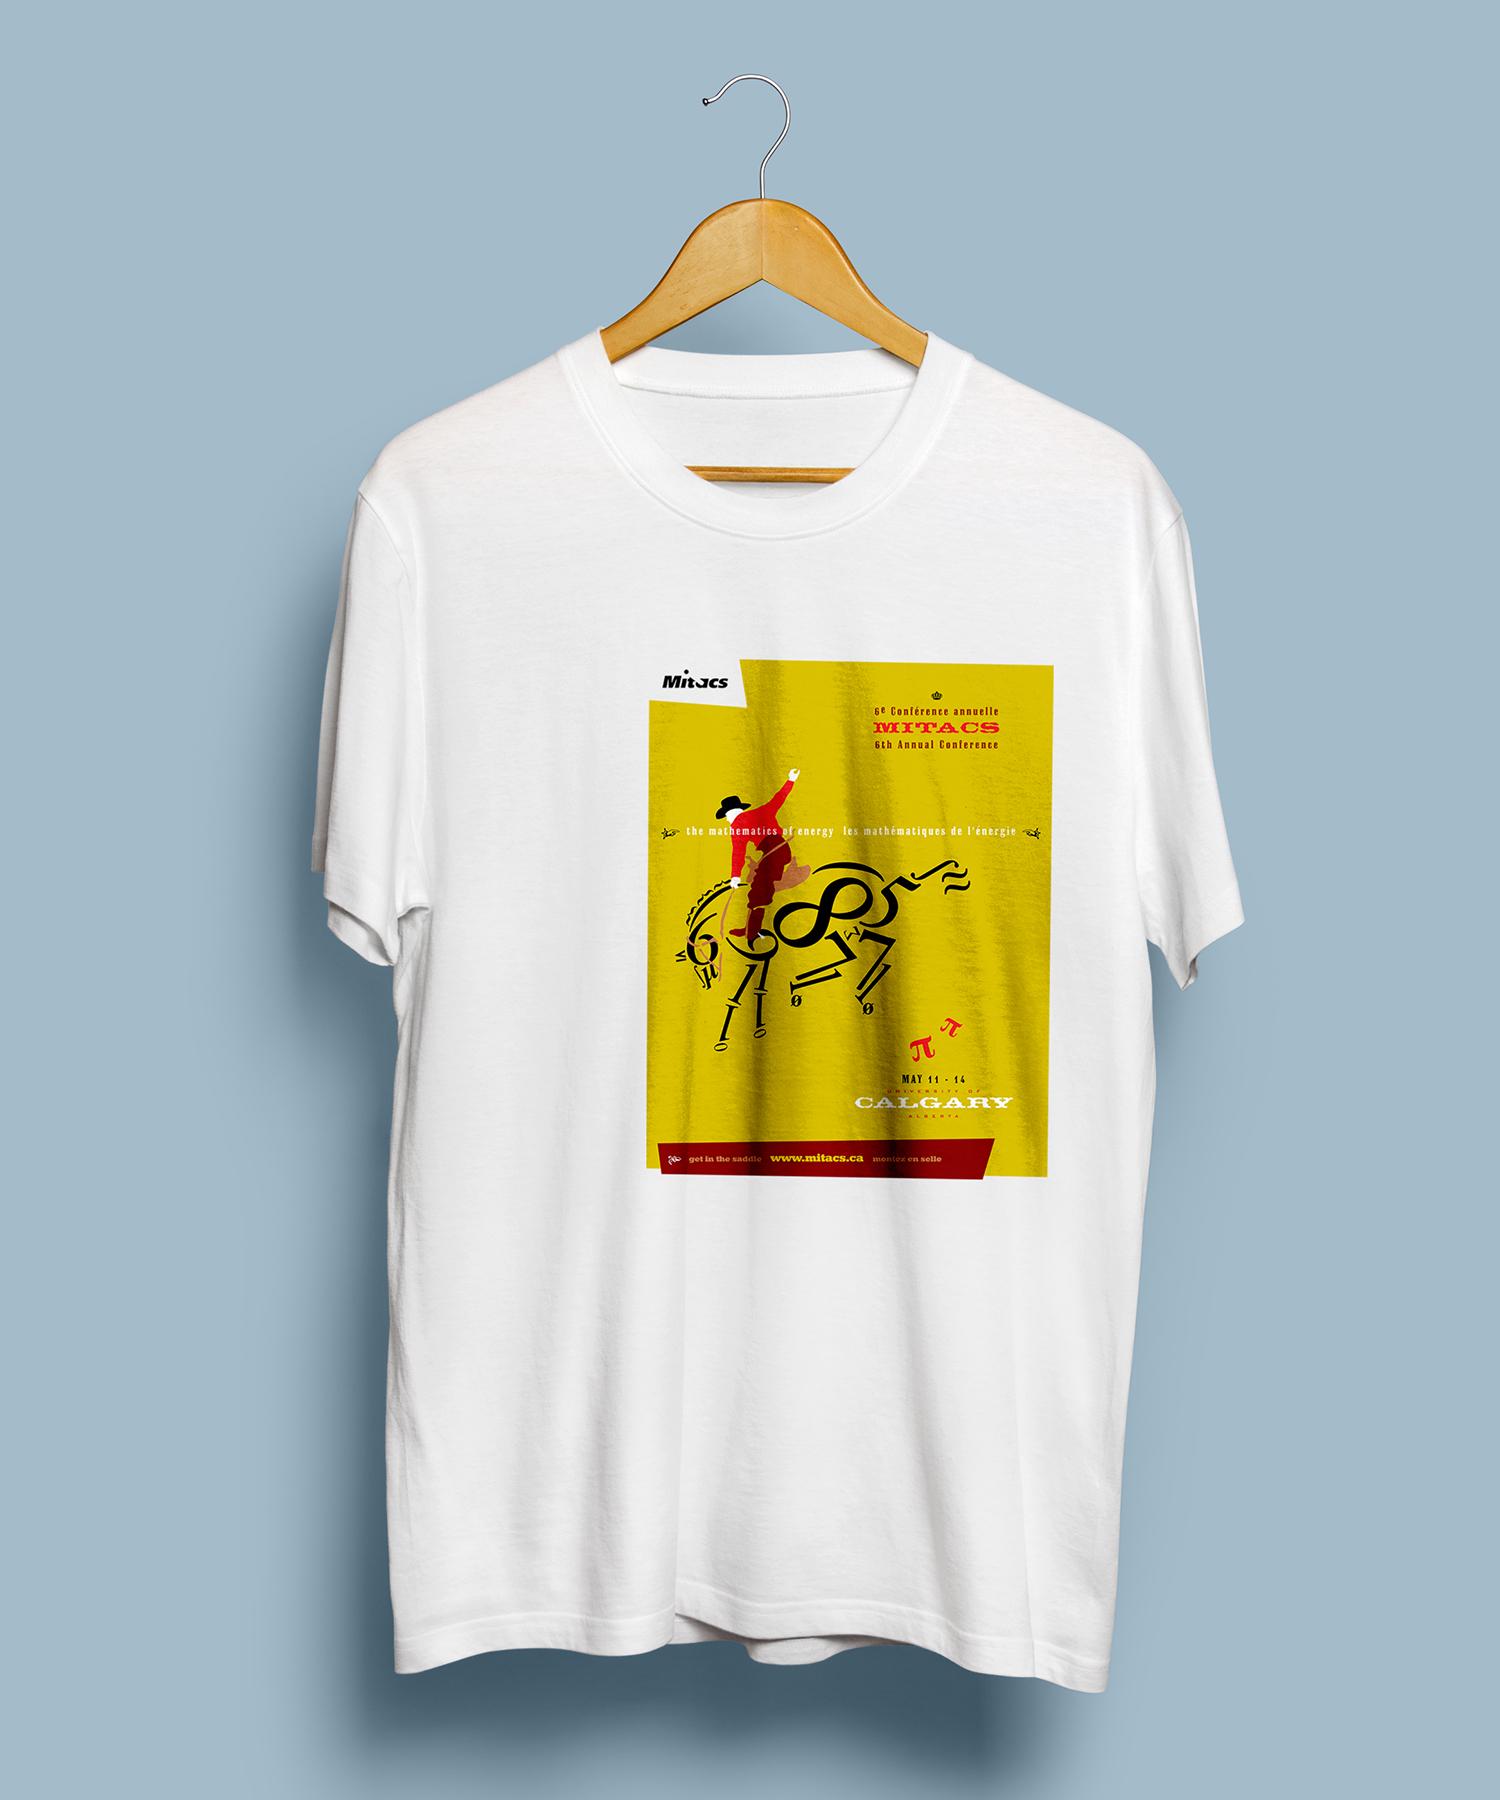 Calgary_T-Shirt Mock-Up Front1_1500x1800.jpg